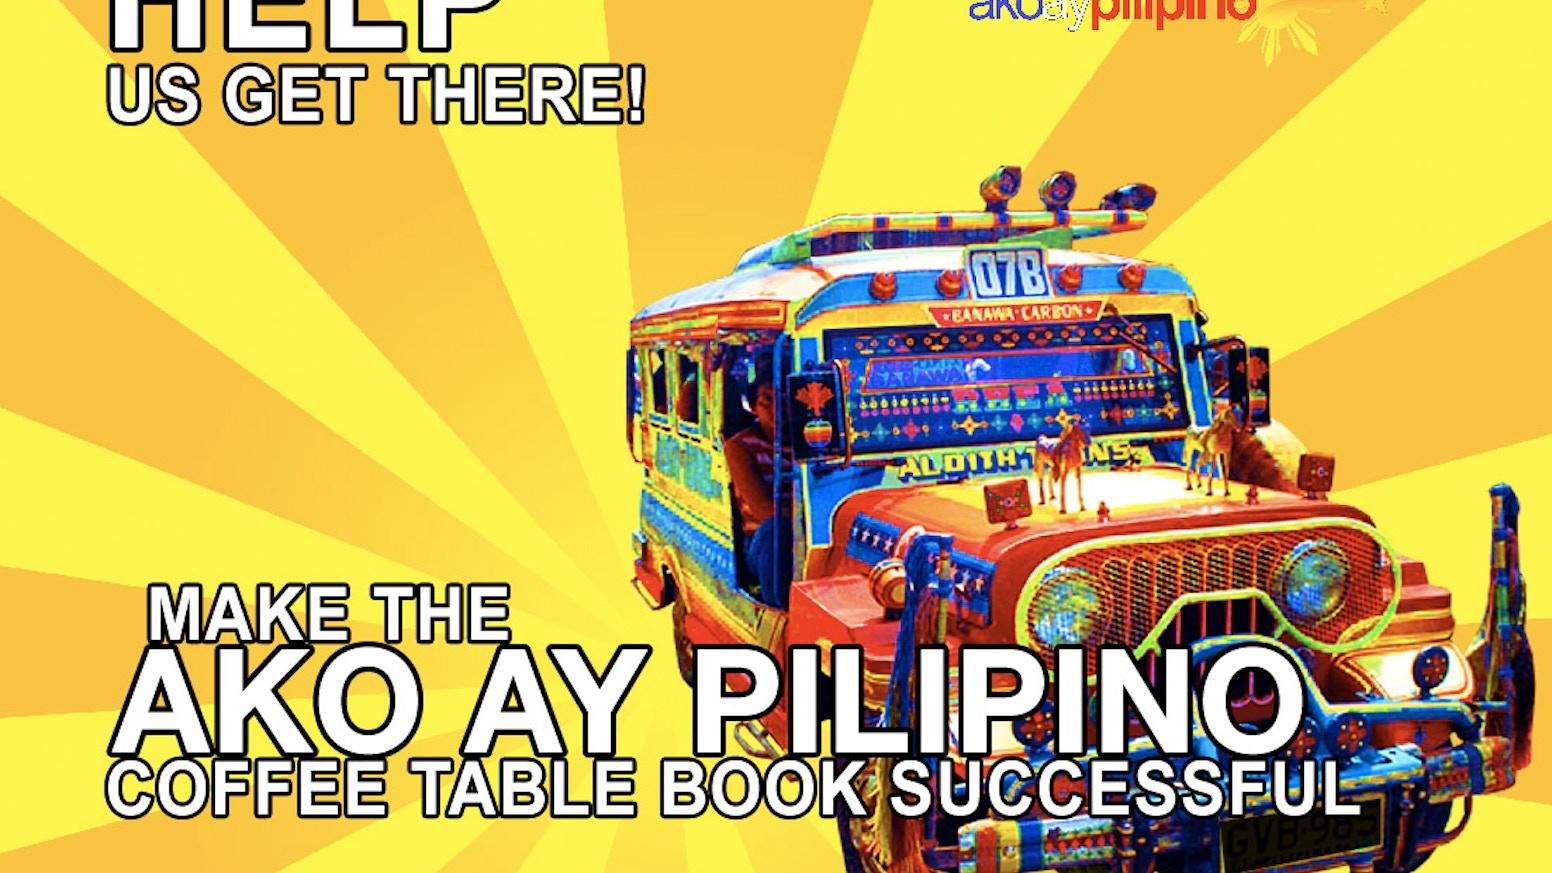 Inspirational Coffee Table Books.Ako Ay Pilipino Coffee Table Book By David Lorna Joannes Kickstarter